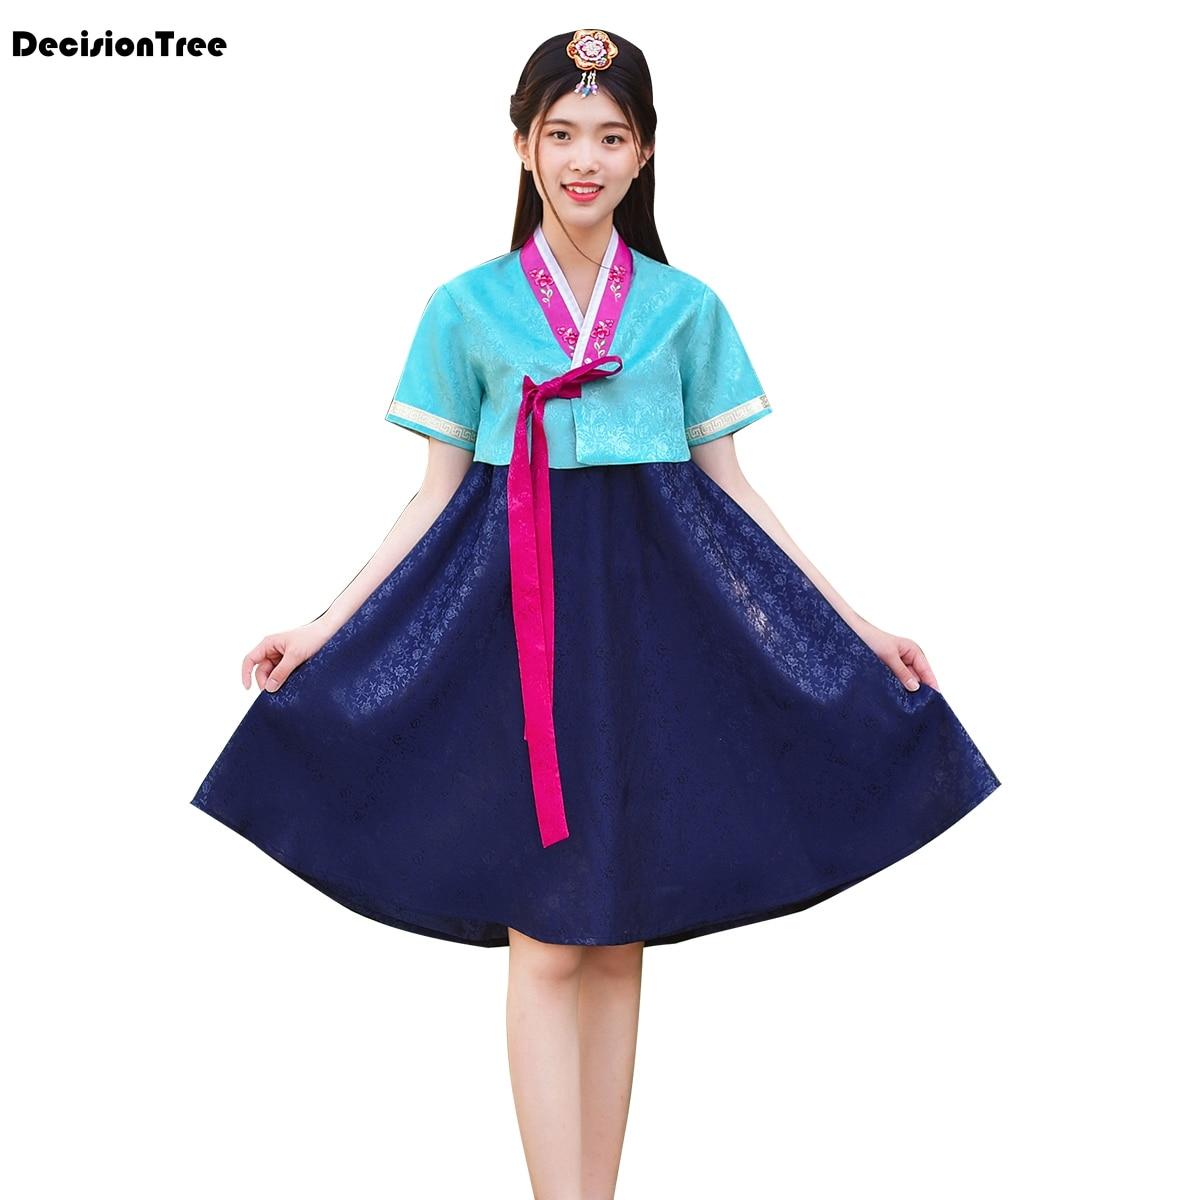 2019 new asia hanbok formal dresses korean traditional clothes women's dresses clothing dance dresses half Sleeve dance costume